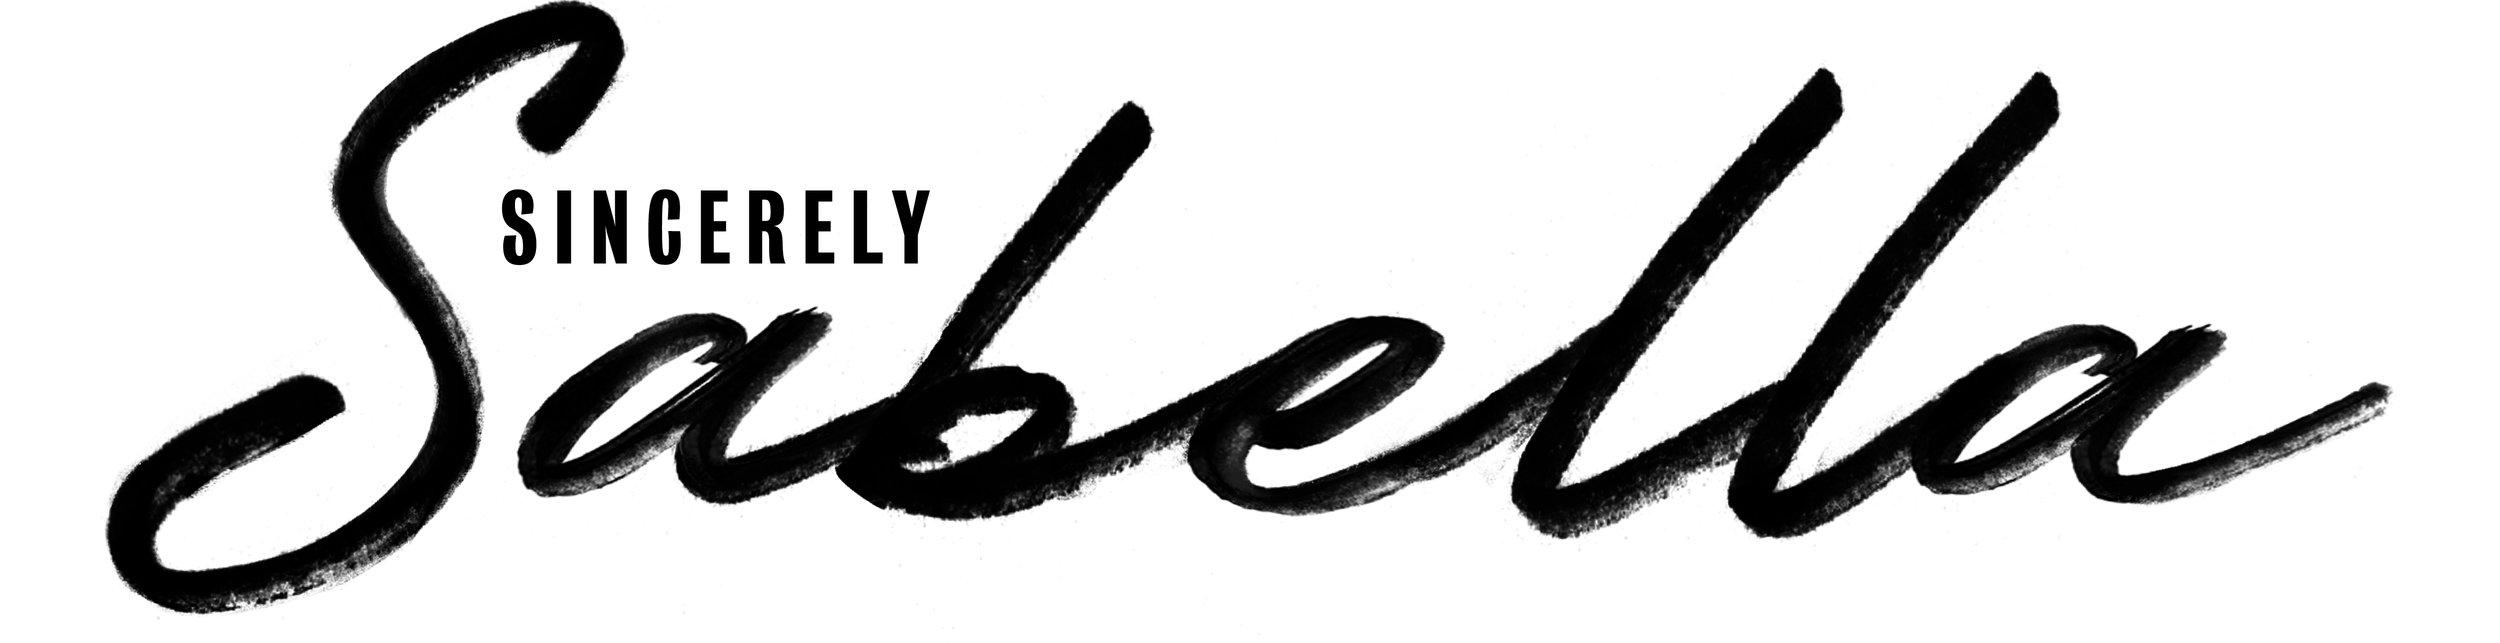 Sabella_Script-logo_Usage Guide_RG_01_K100_max_size.jpg